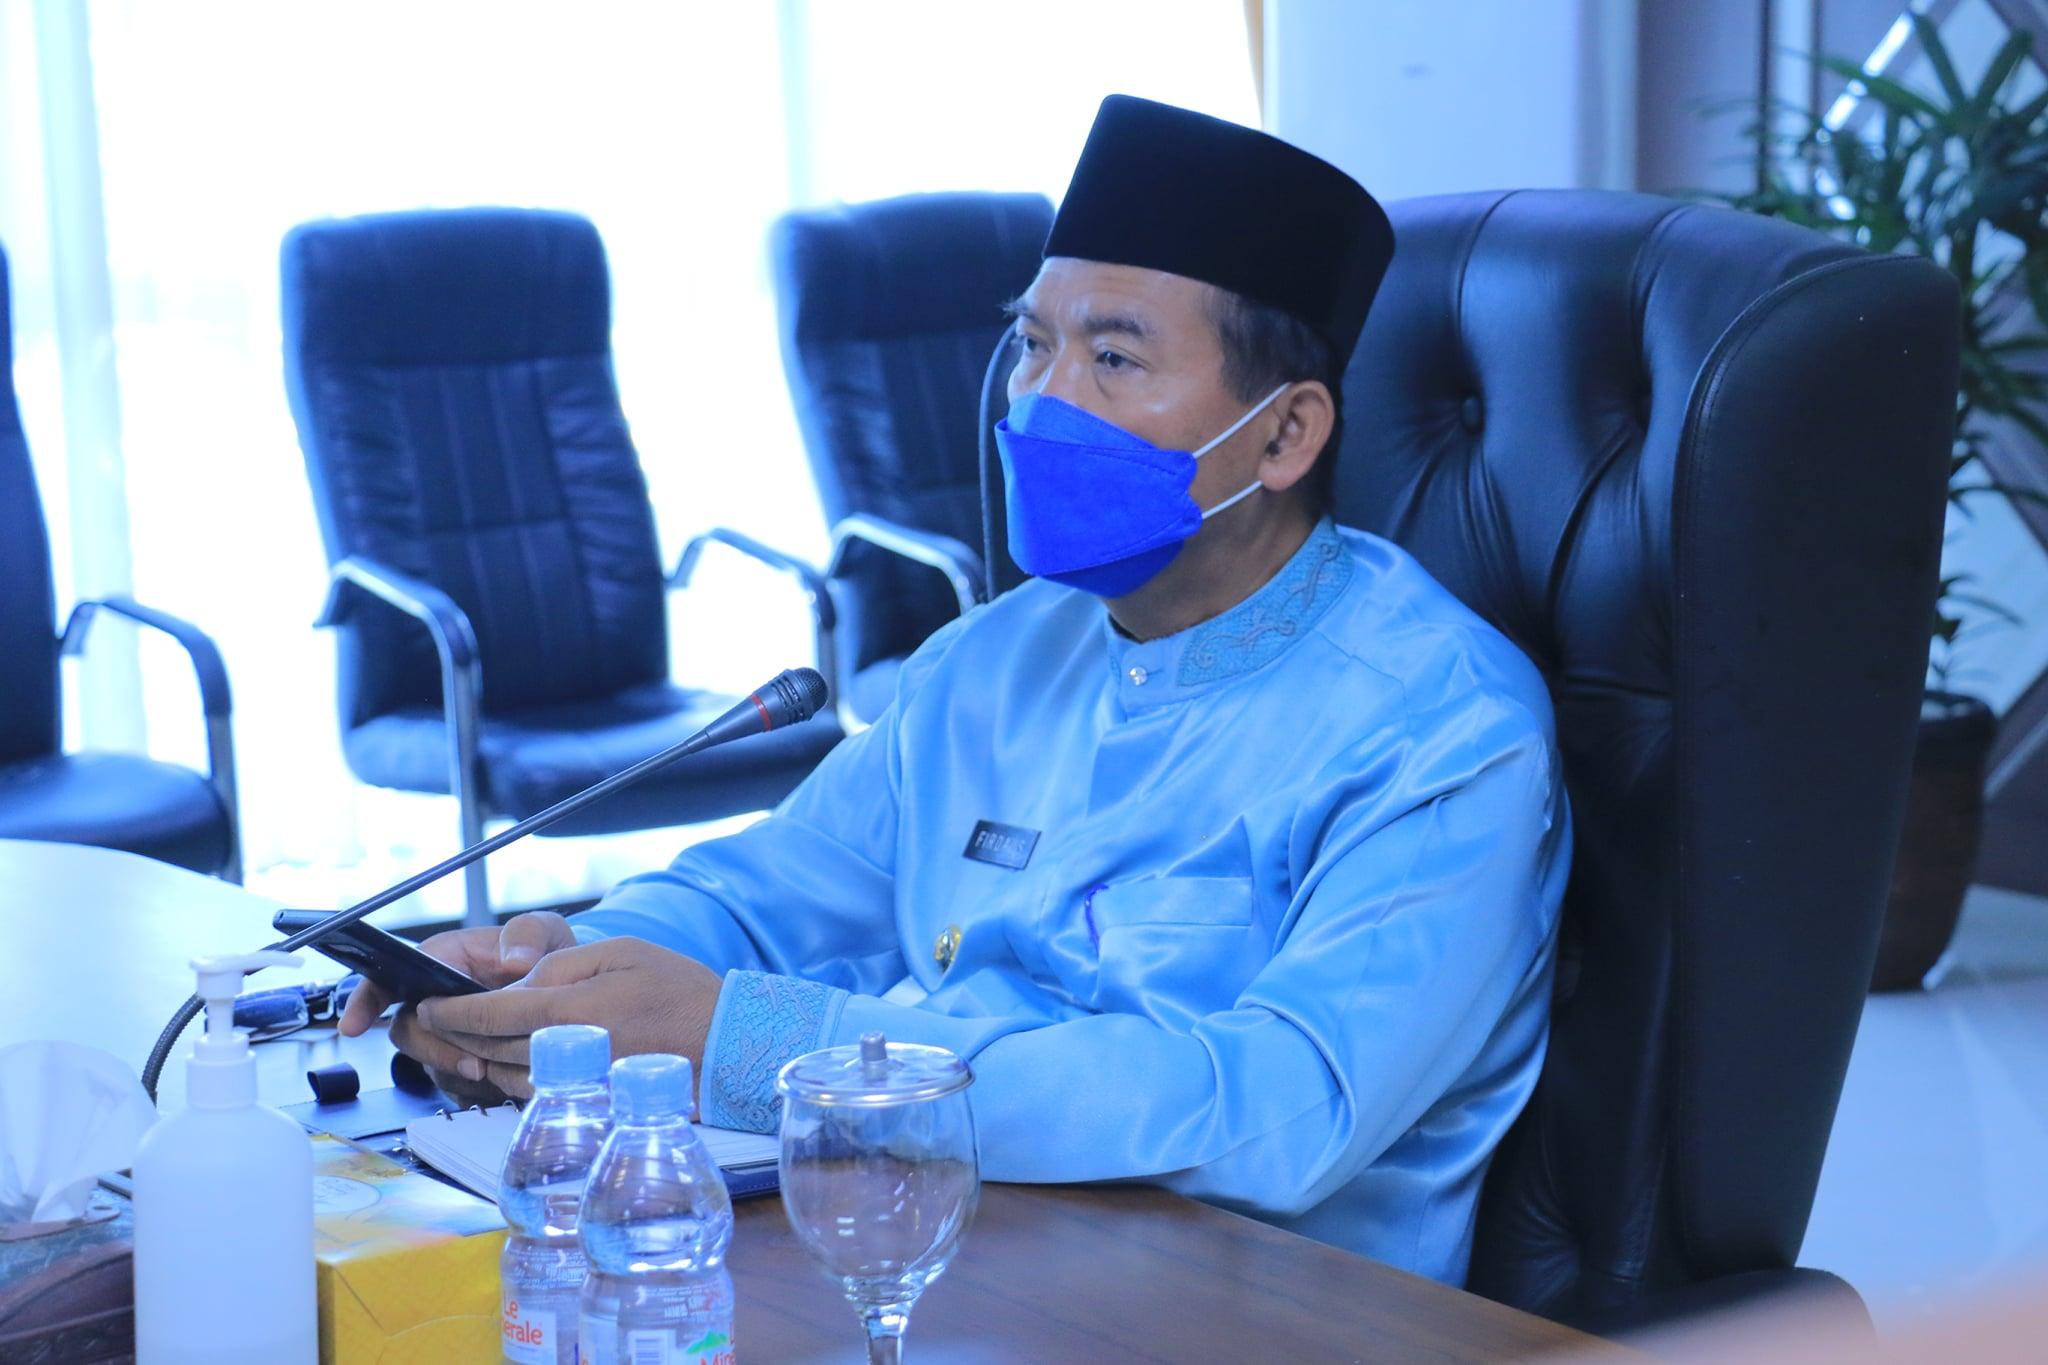 Walikota evaluasi Pendapatan Bapenda Kota Pekanbaru